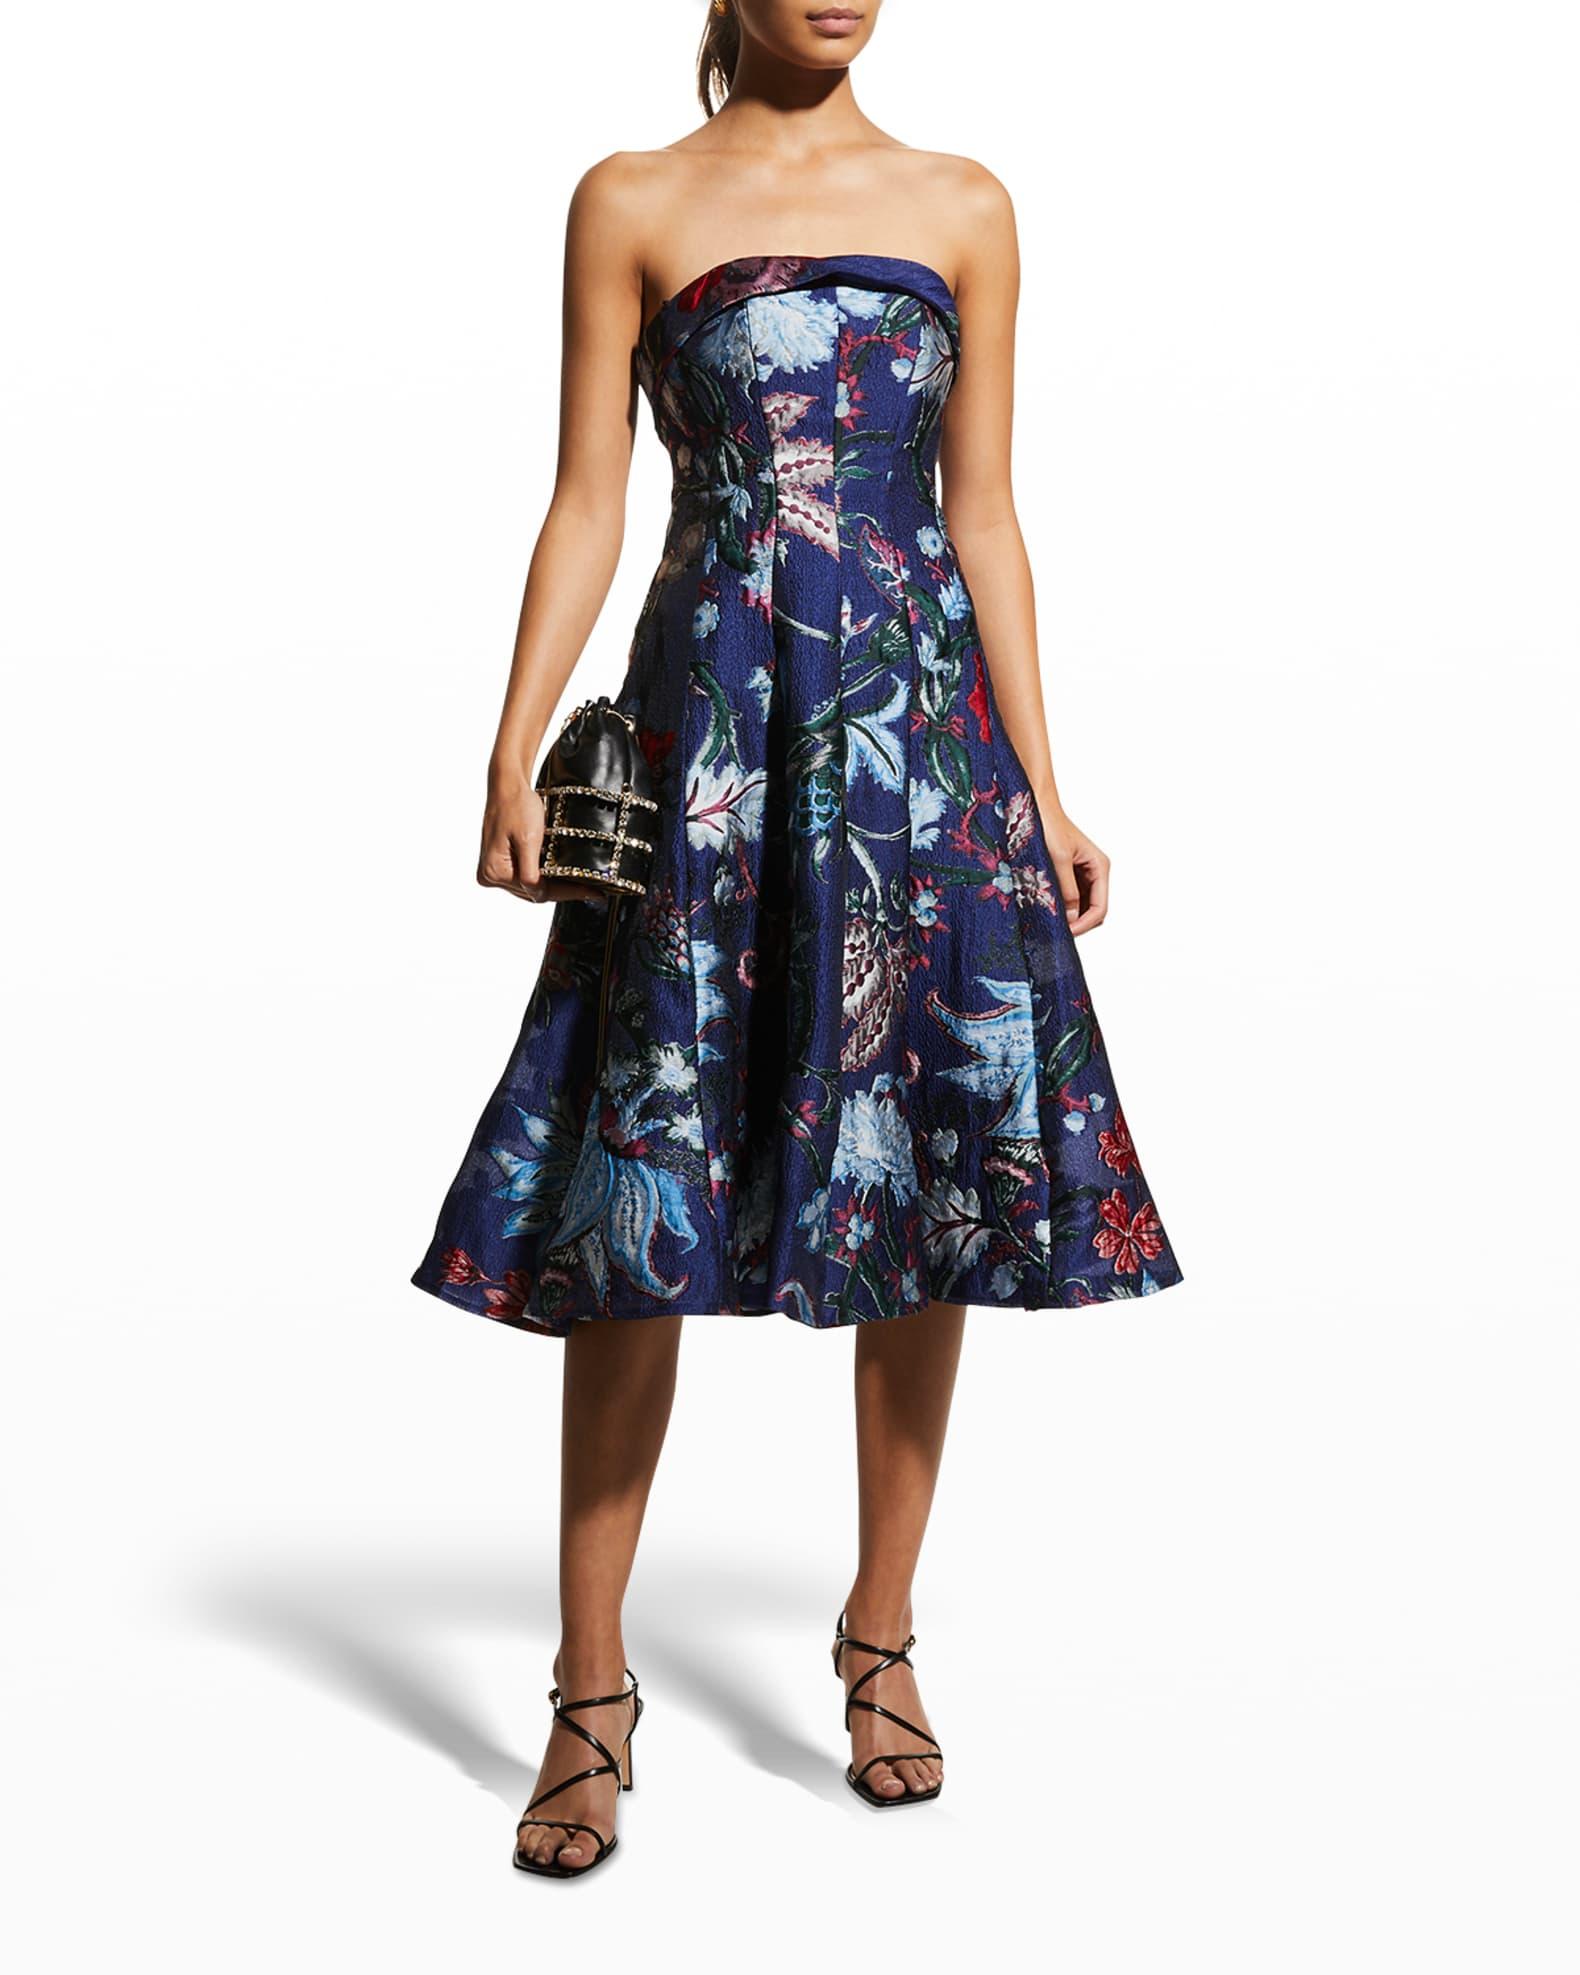 MARCHESA NOTTE Strapless Floral Cocktail Dress